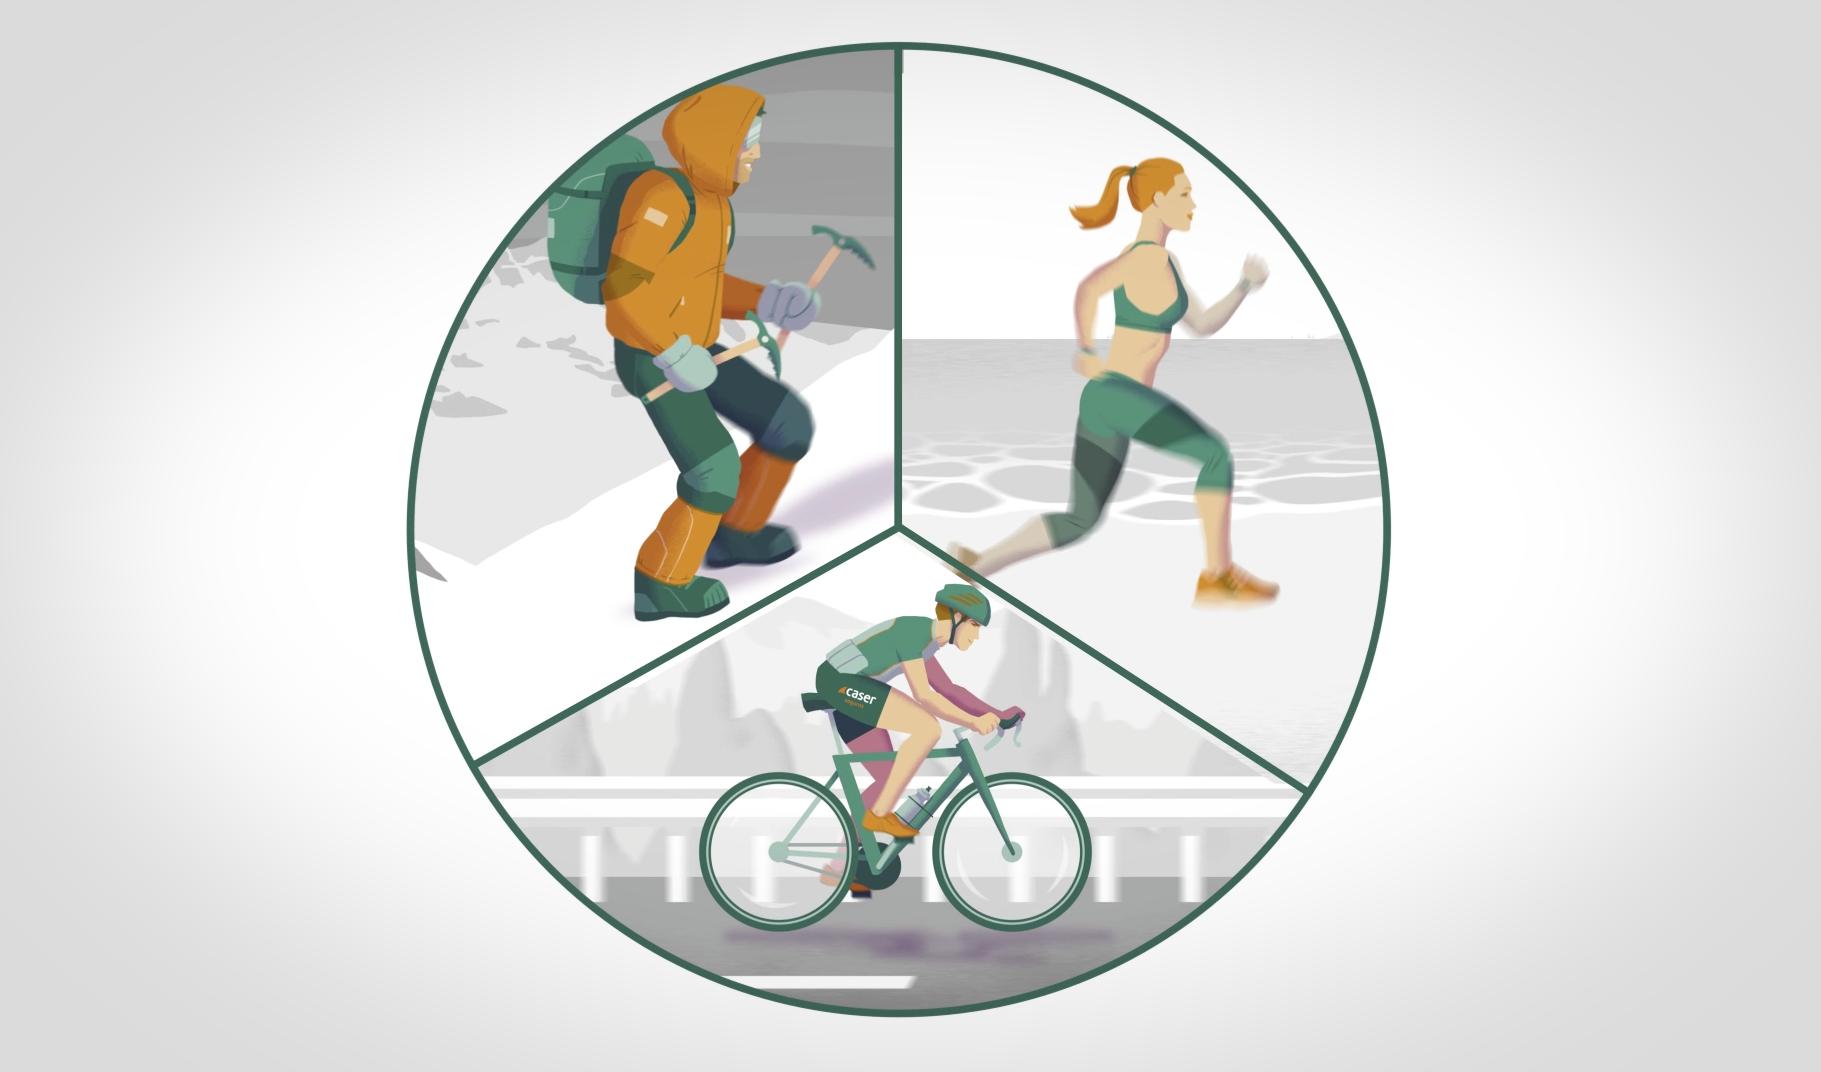 Caser seguro deportistas